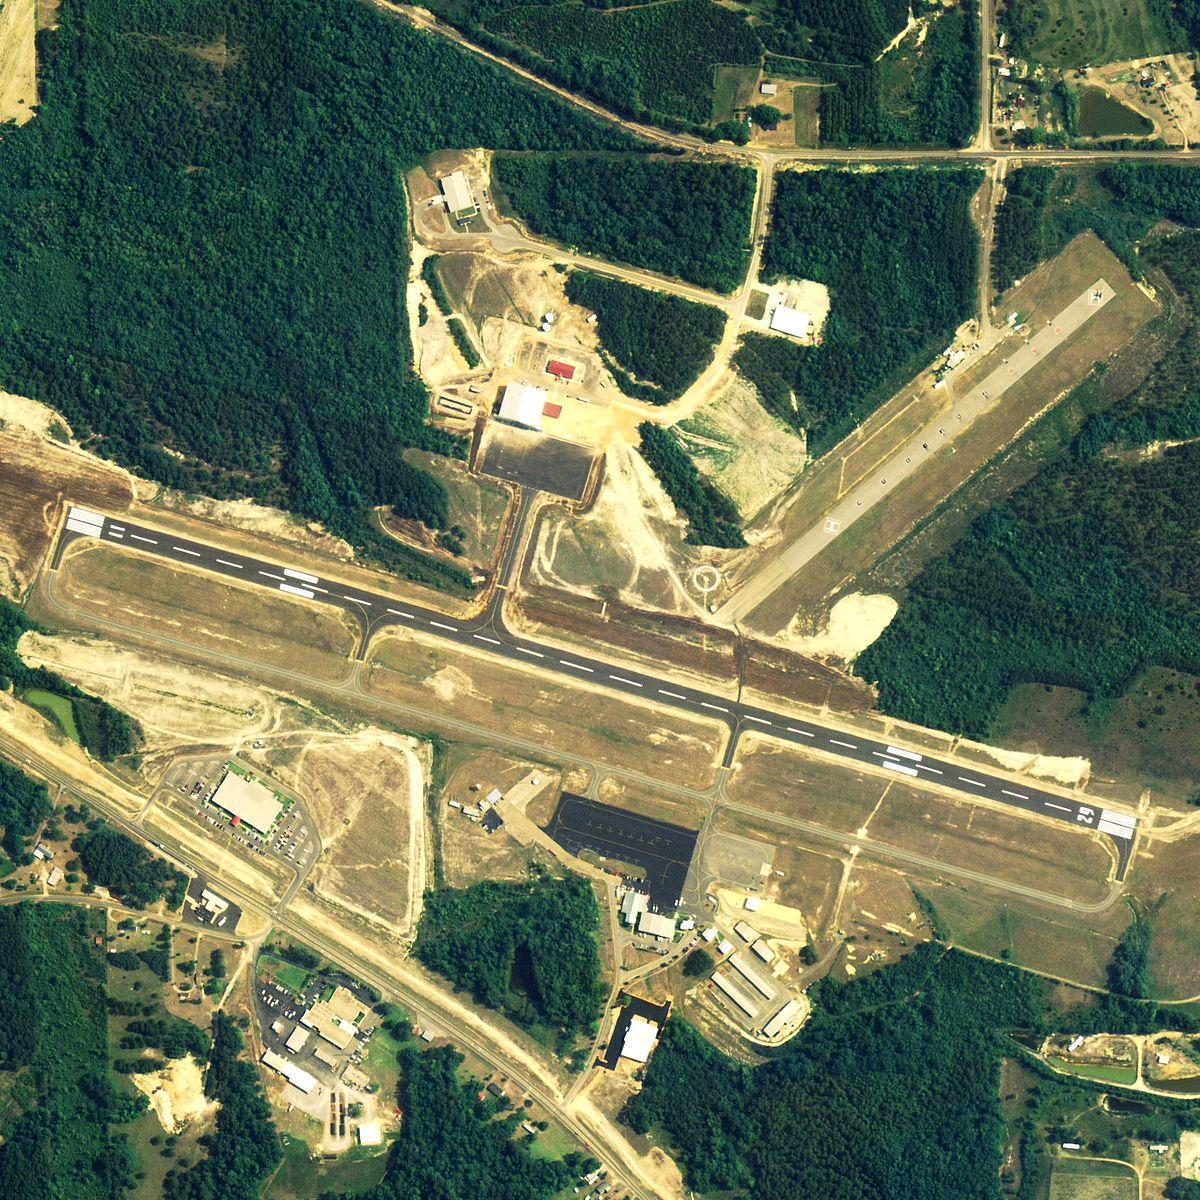 South Alabama Regional Airport Wikipedia - Alabama airports